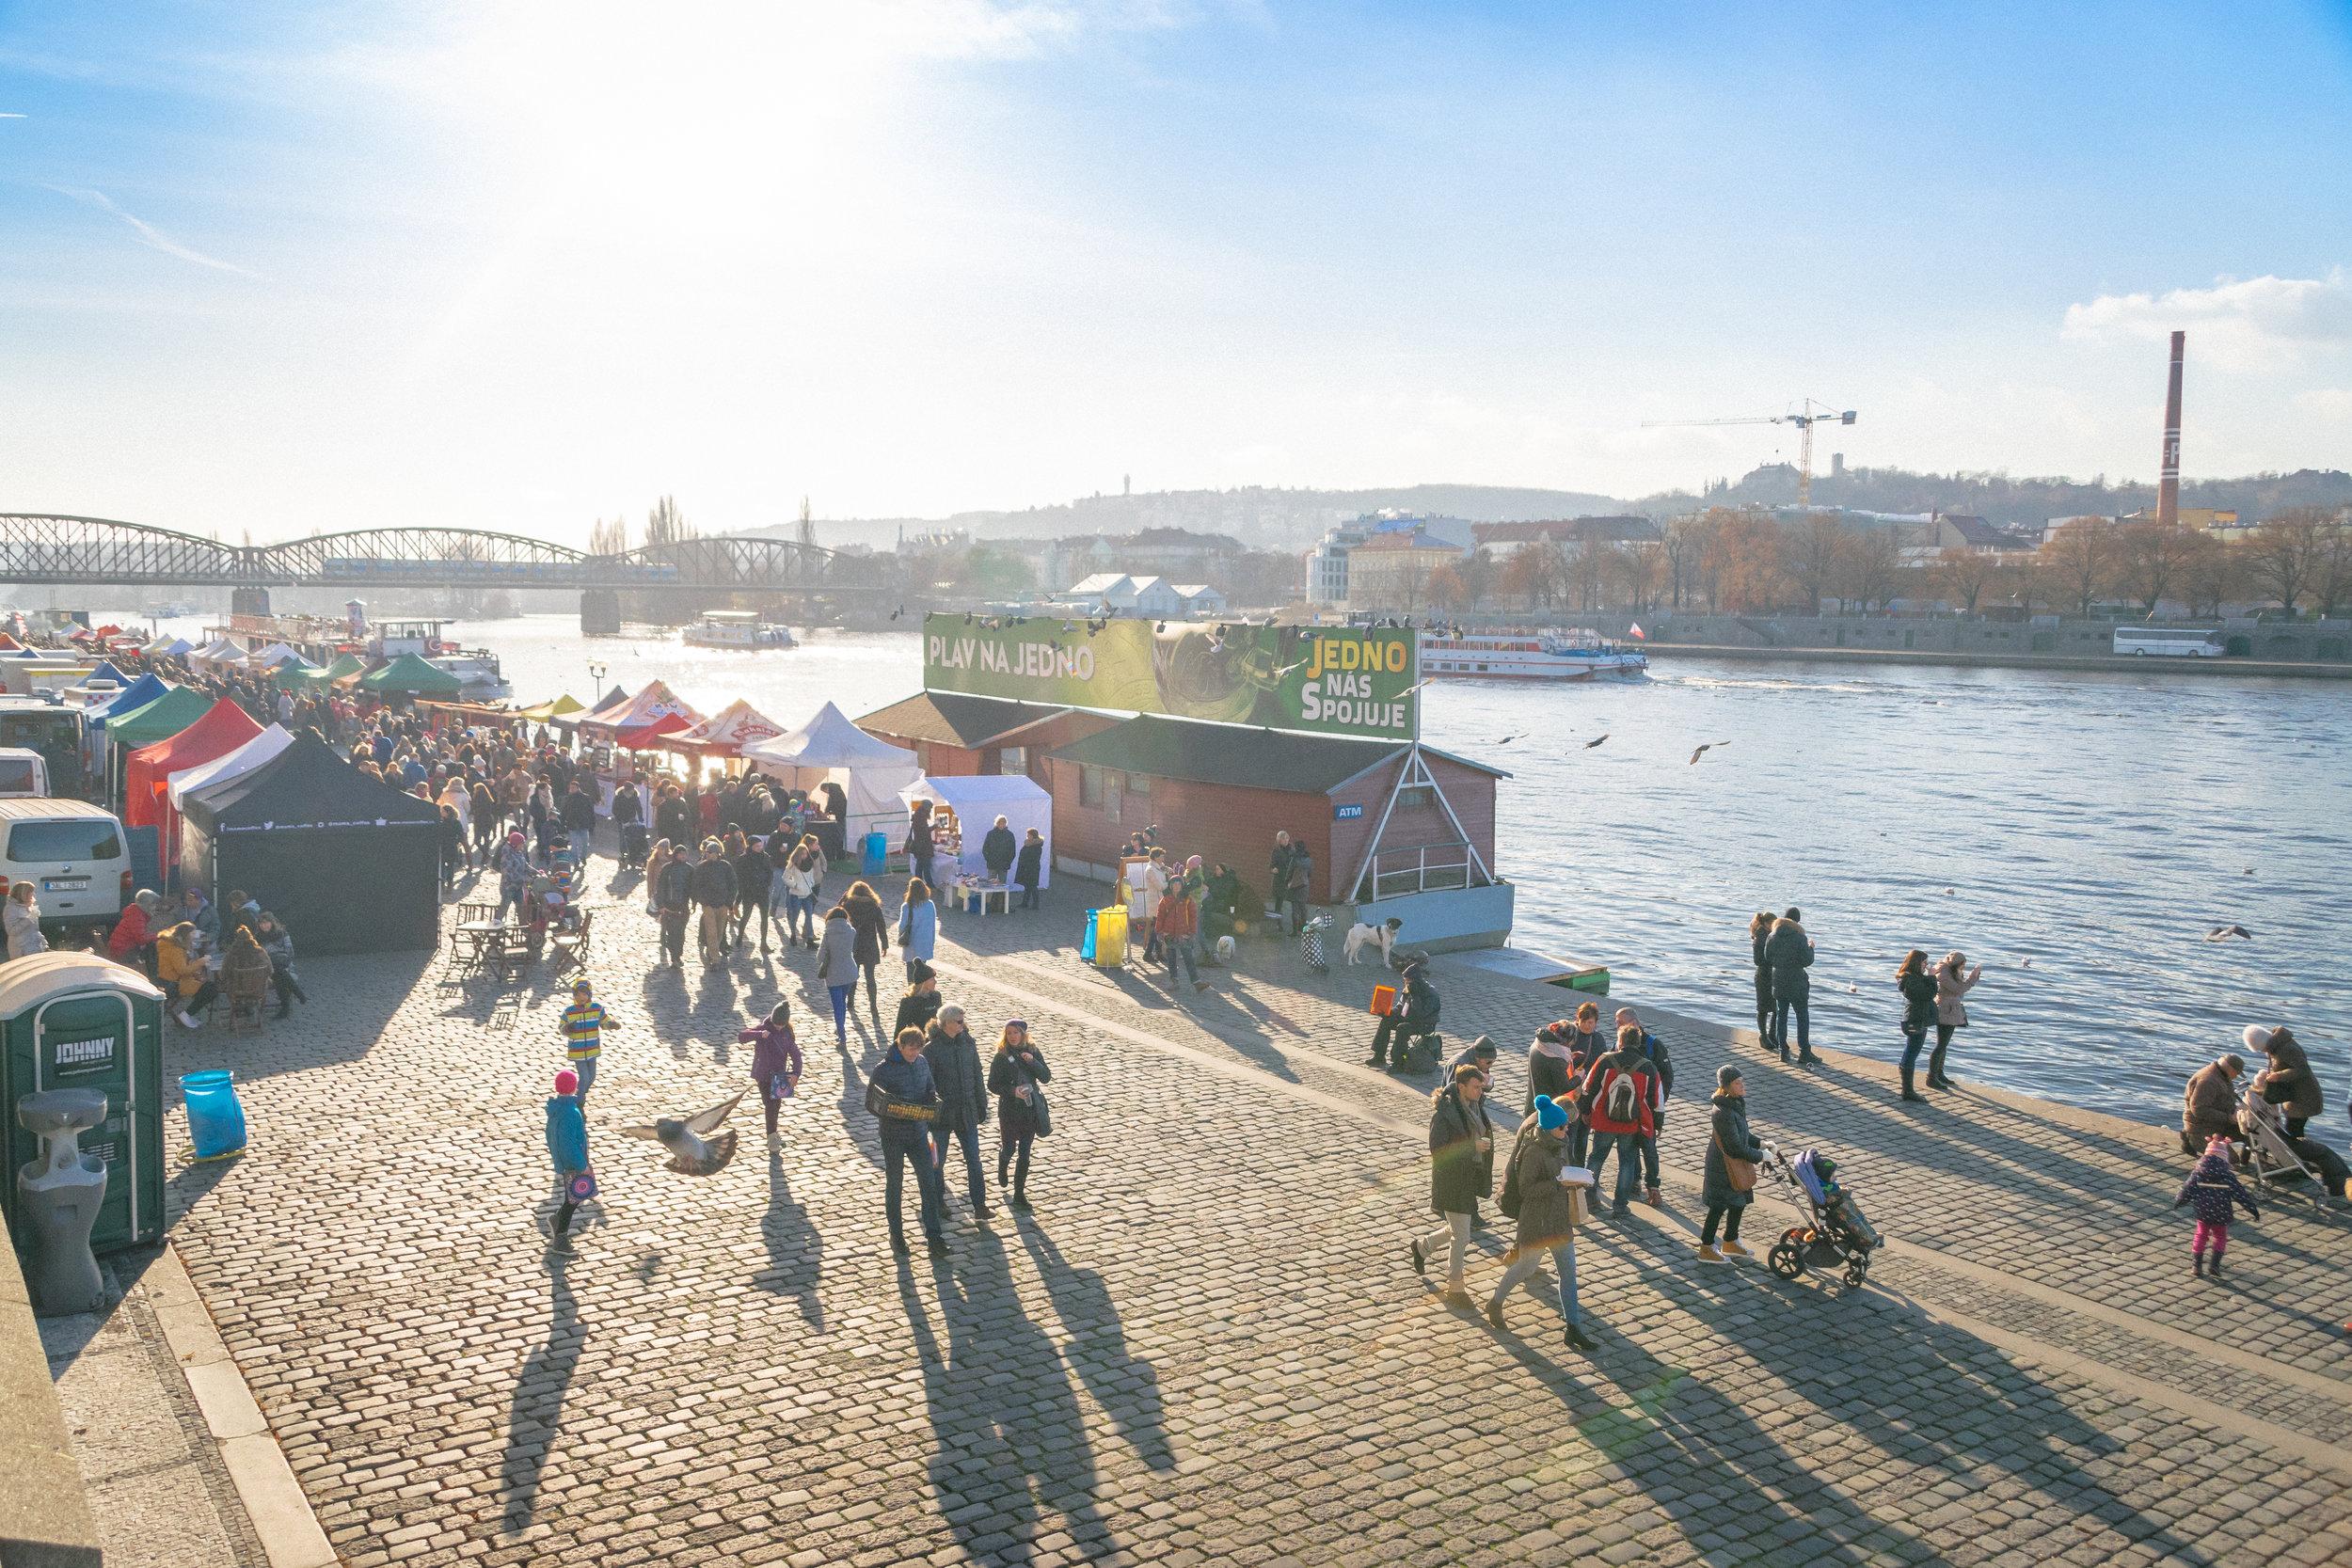 Naplavka Farmers' Market